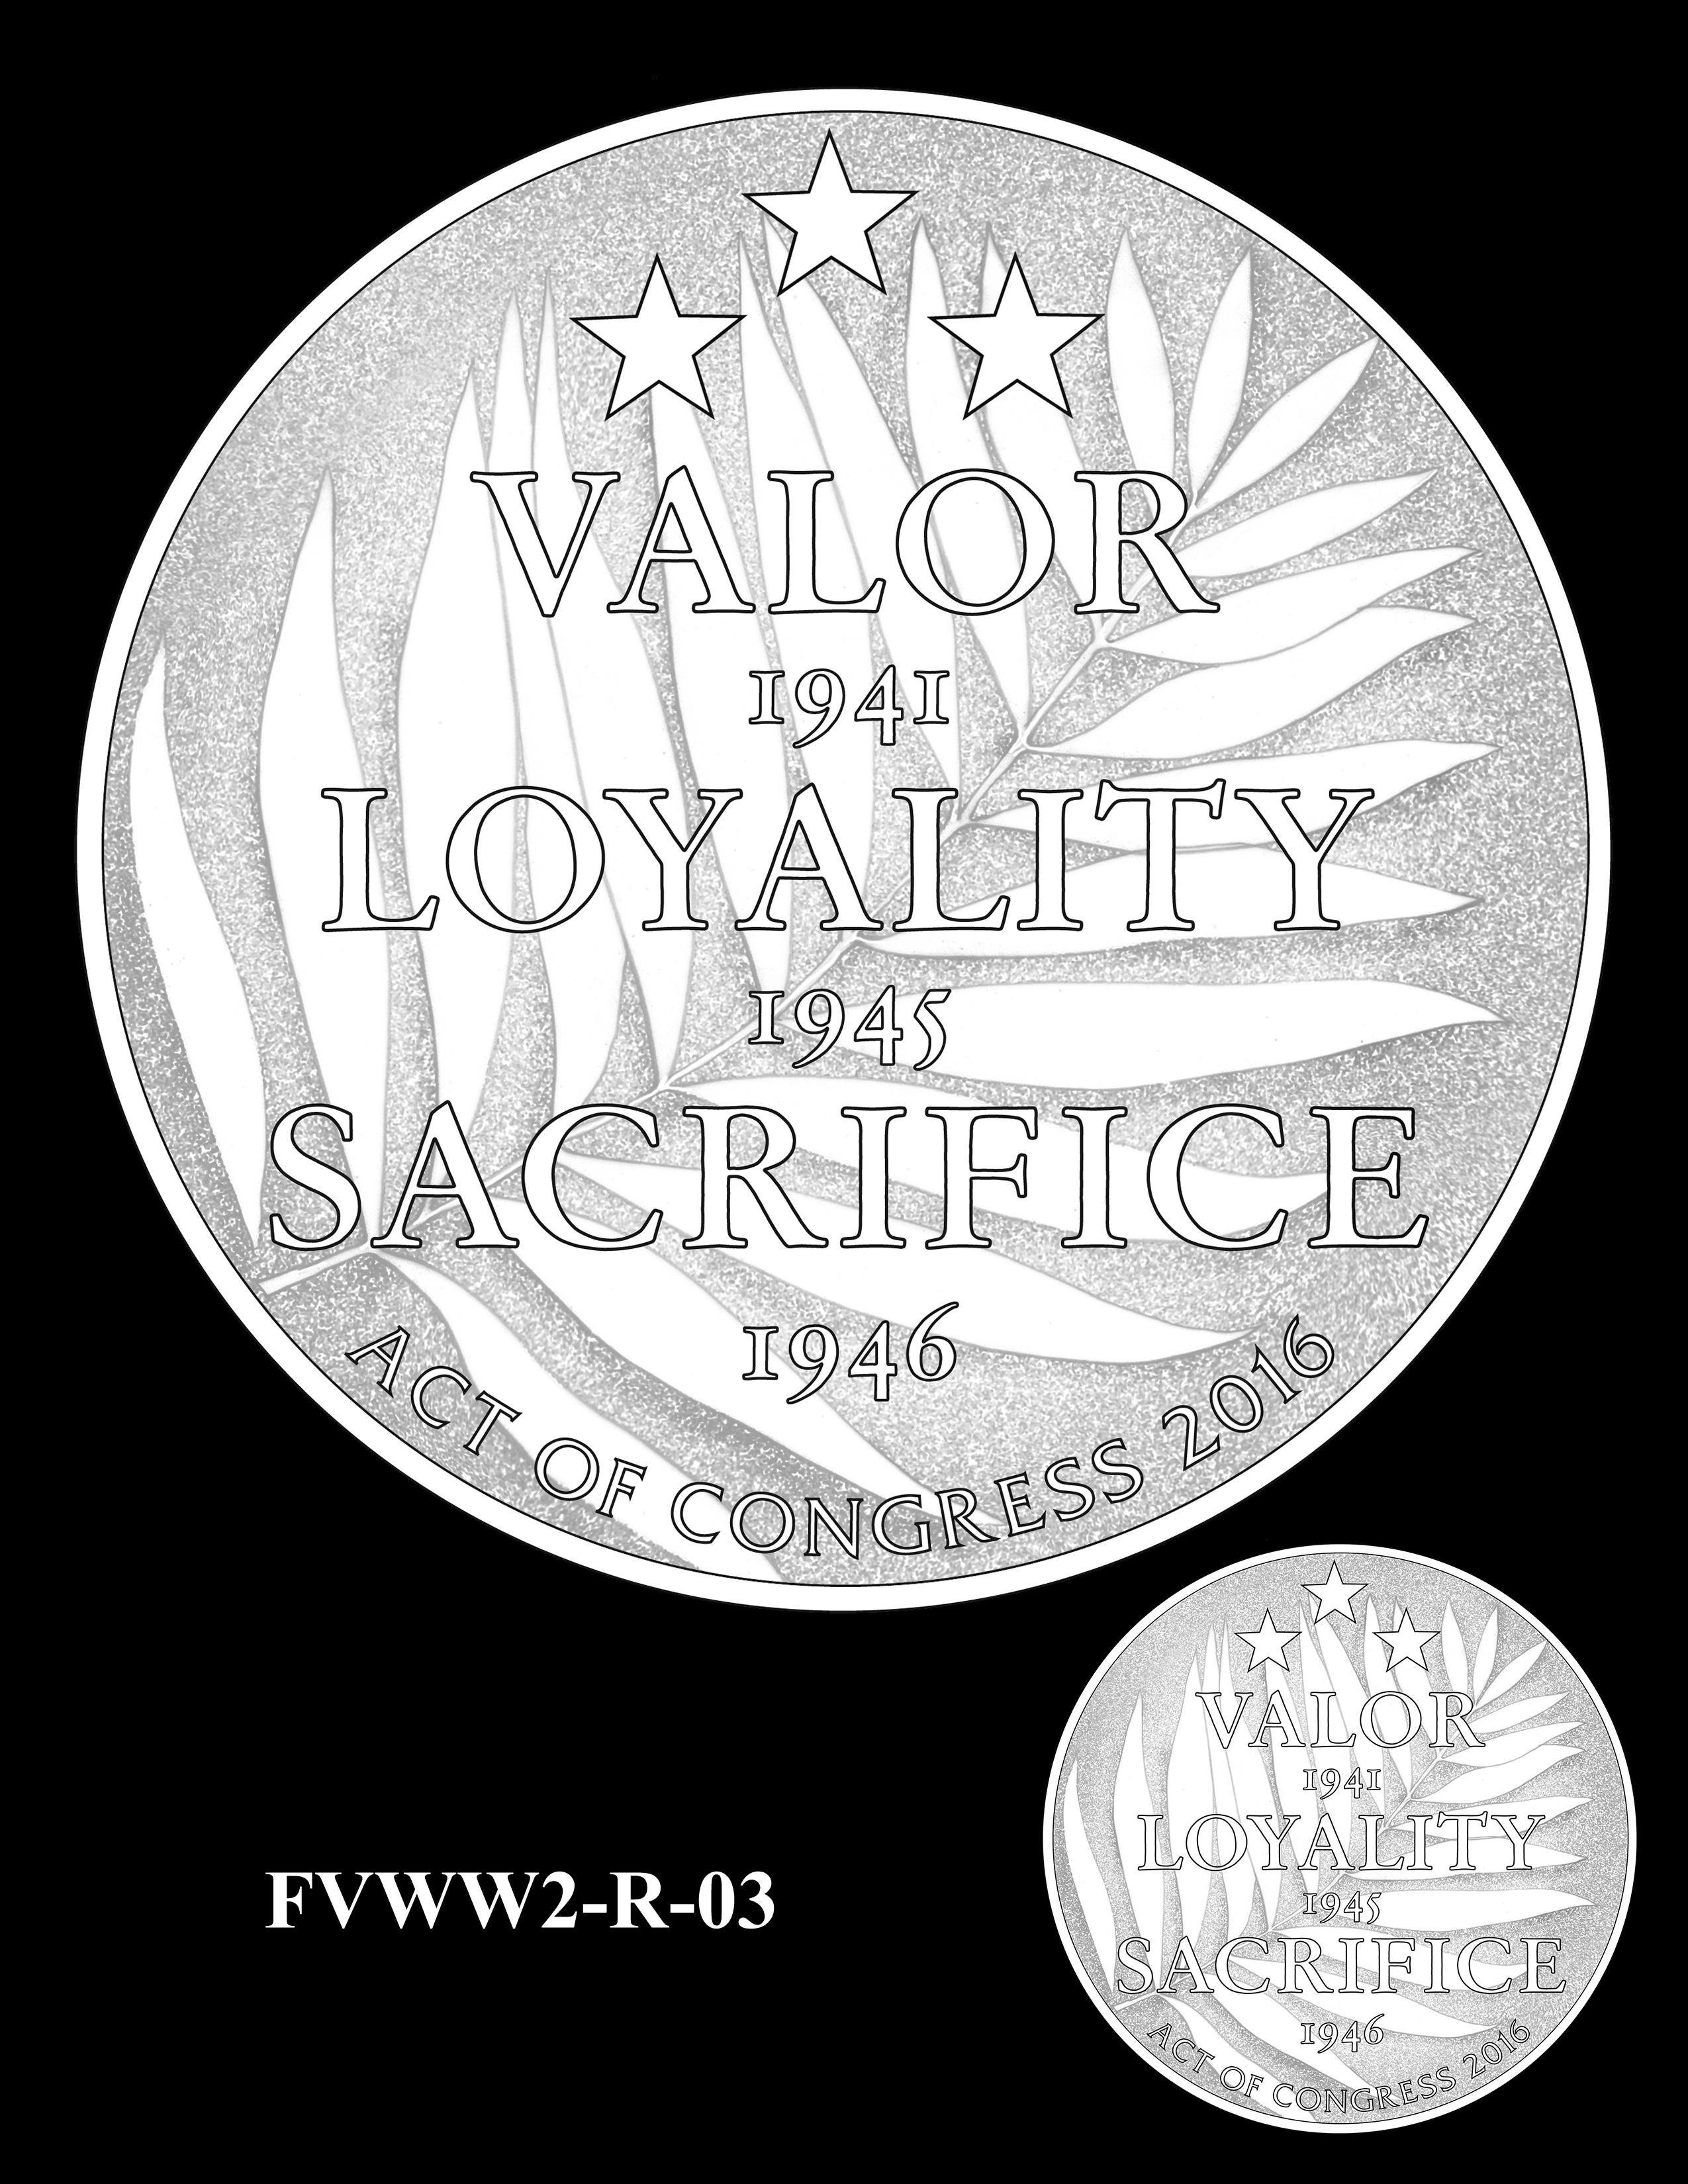 FVWW2-R-03 -- Filipino Veterans of World War II Congressional Gold Medal